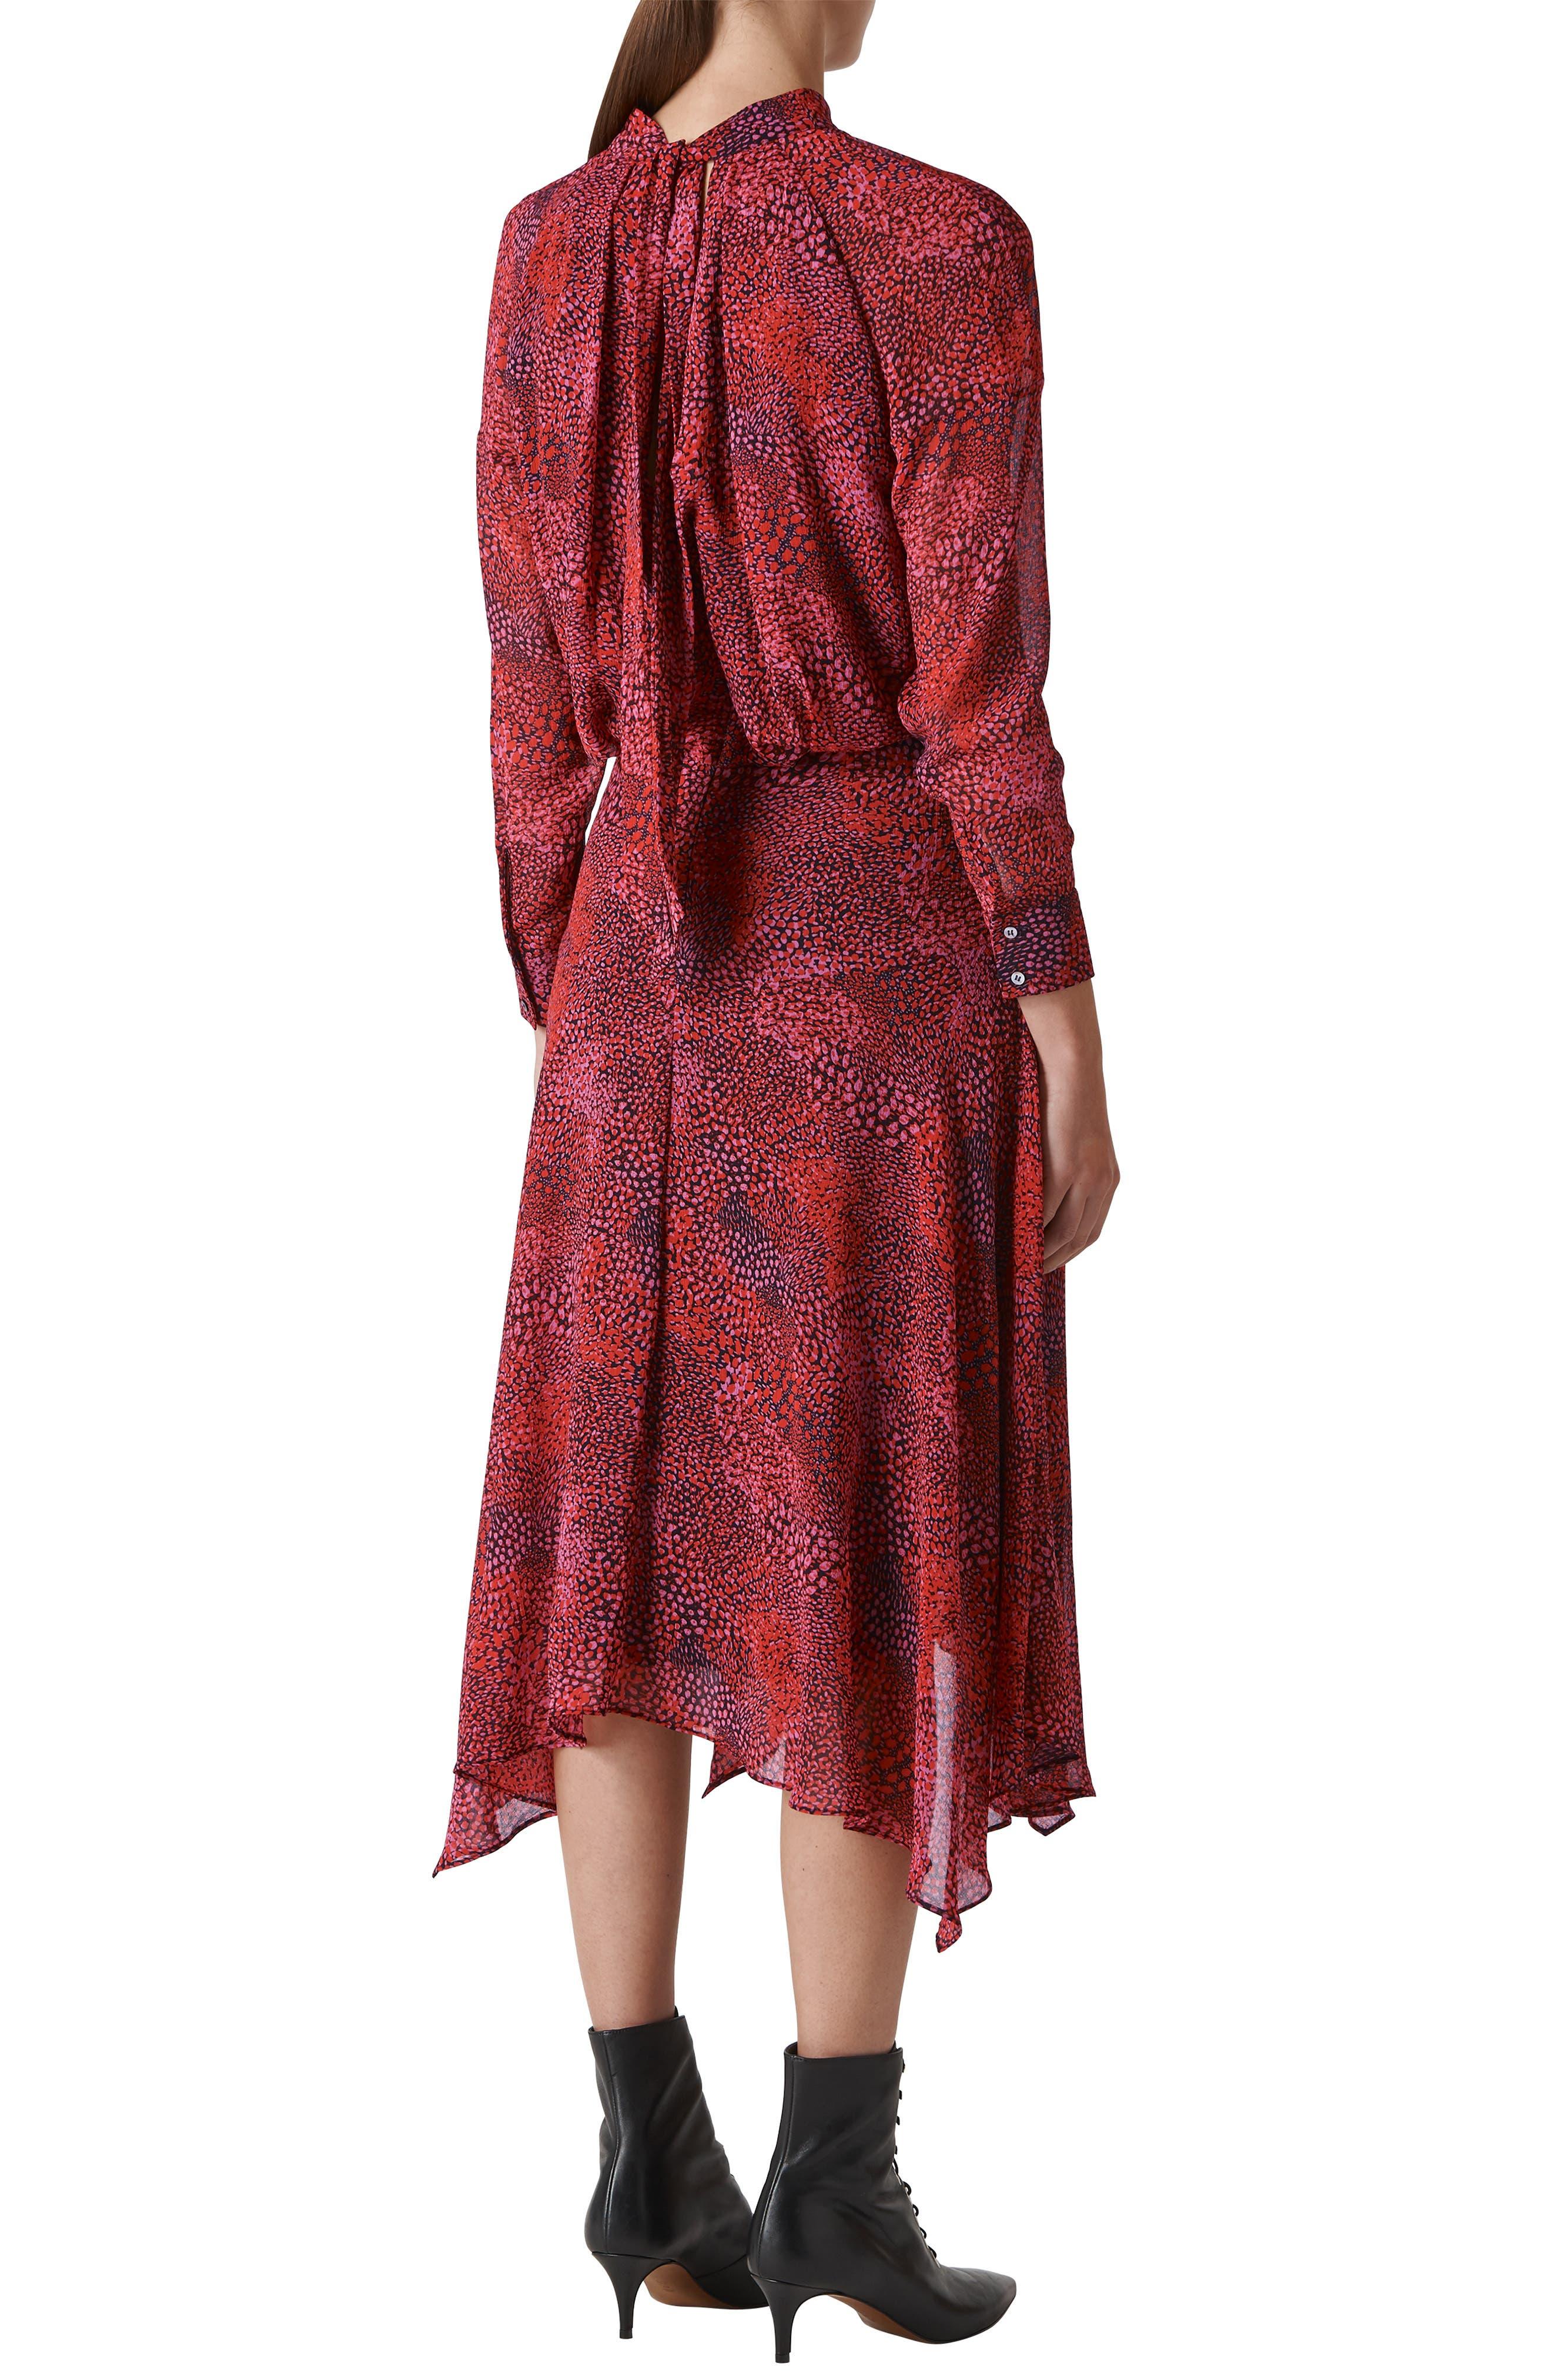 WHISTLES,                             Carlotta Abstract Animal Print Dress,                             Alternate thumbnail 2, color,                             PINK/ MULTI